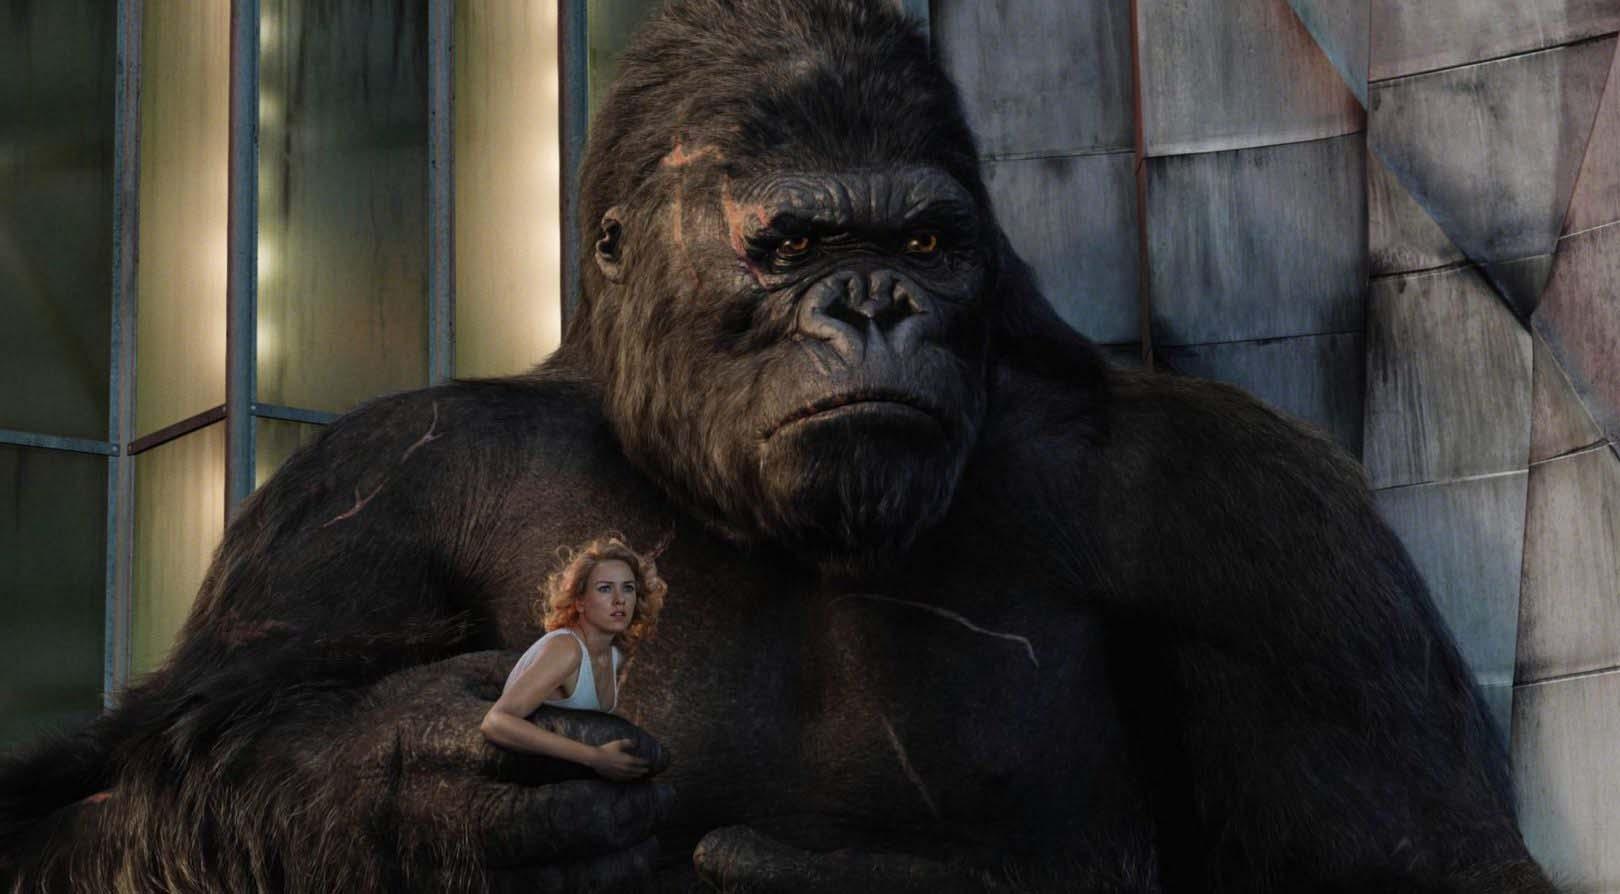 kong: ostrov cherepa, kak menjalsja obraz king-konga v kino, DTF Magazine